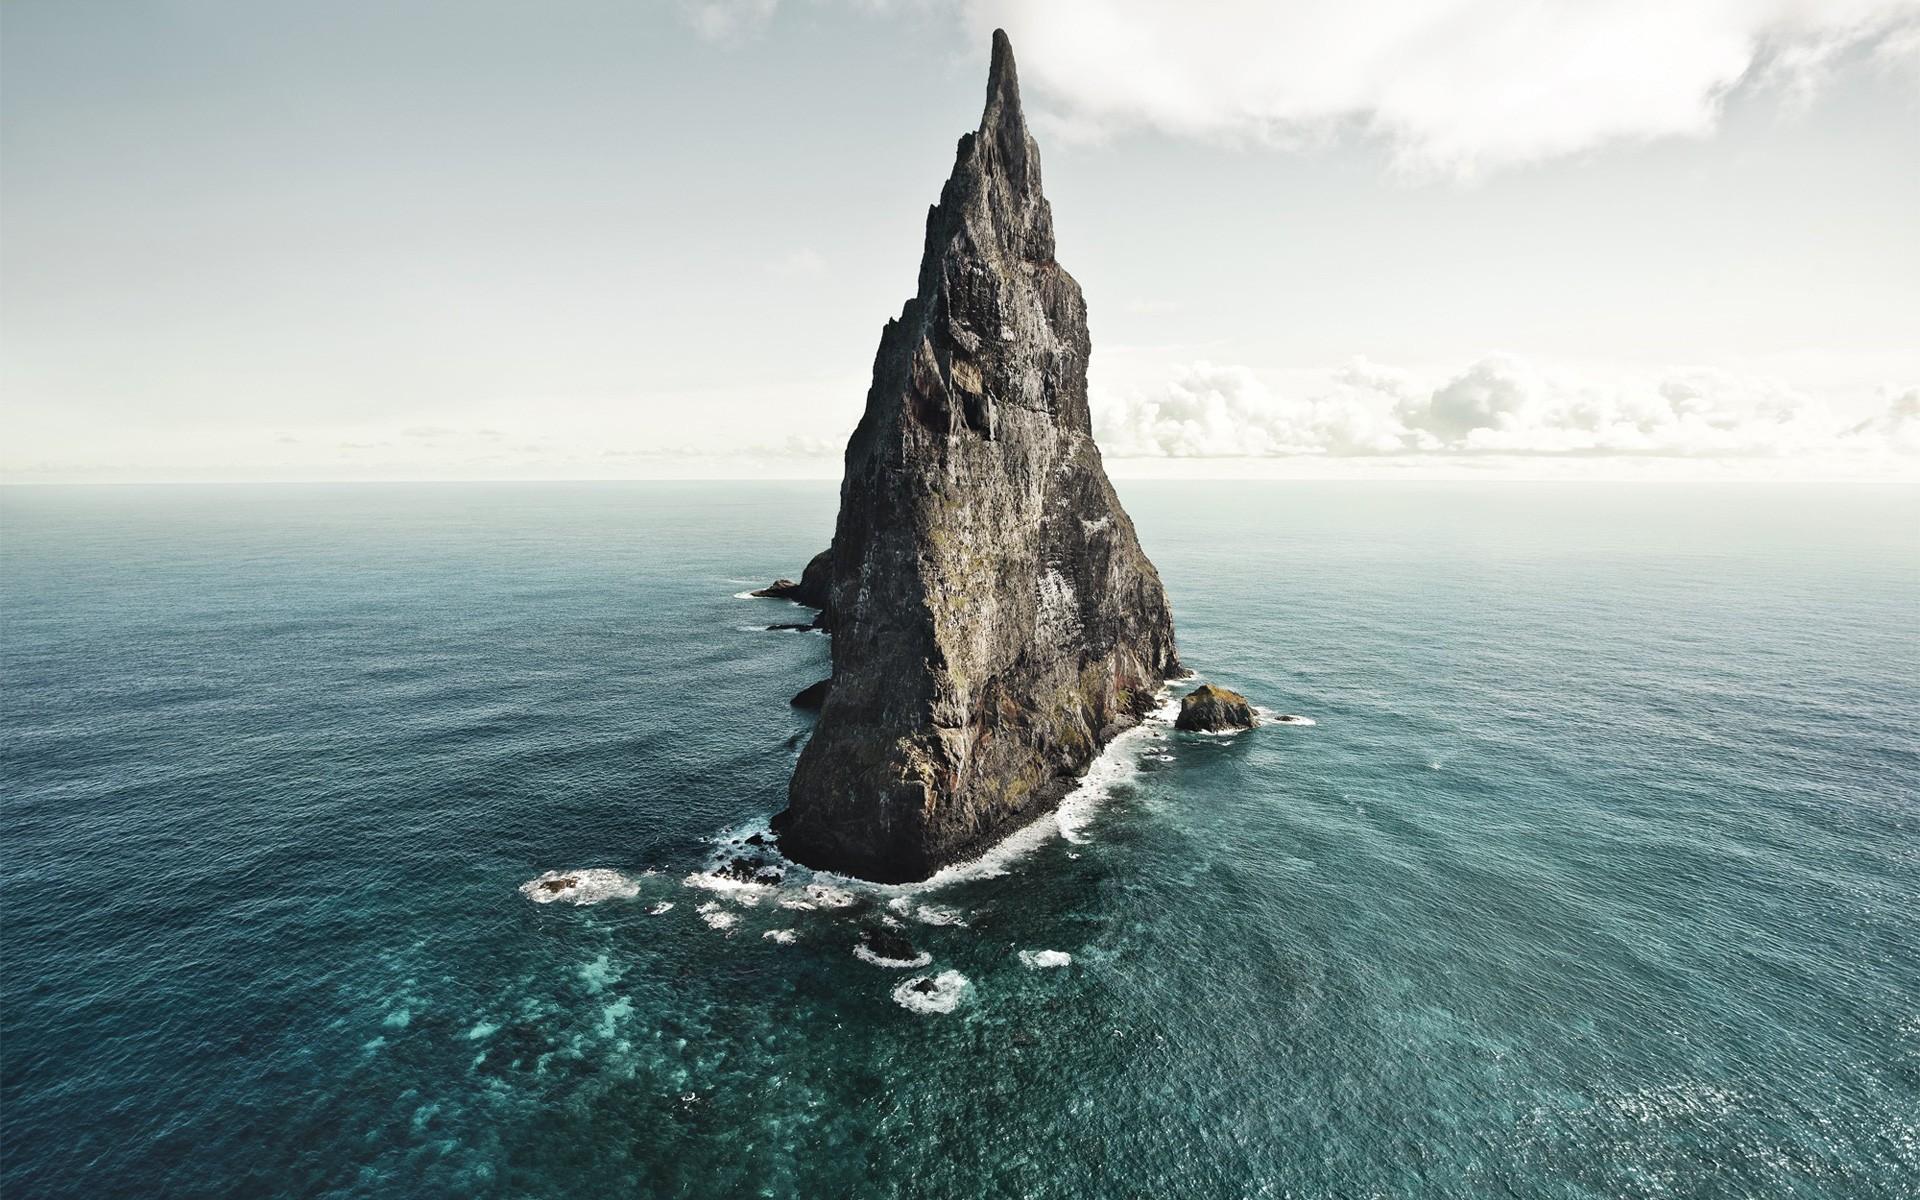 2560x1080 Fall Mountain Wallpaper Pyramid Australia Sea Hd Nature 4k Wallpapers Images